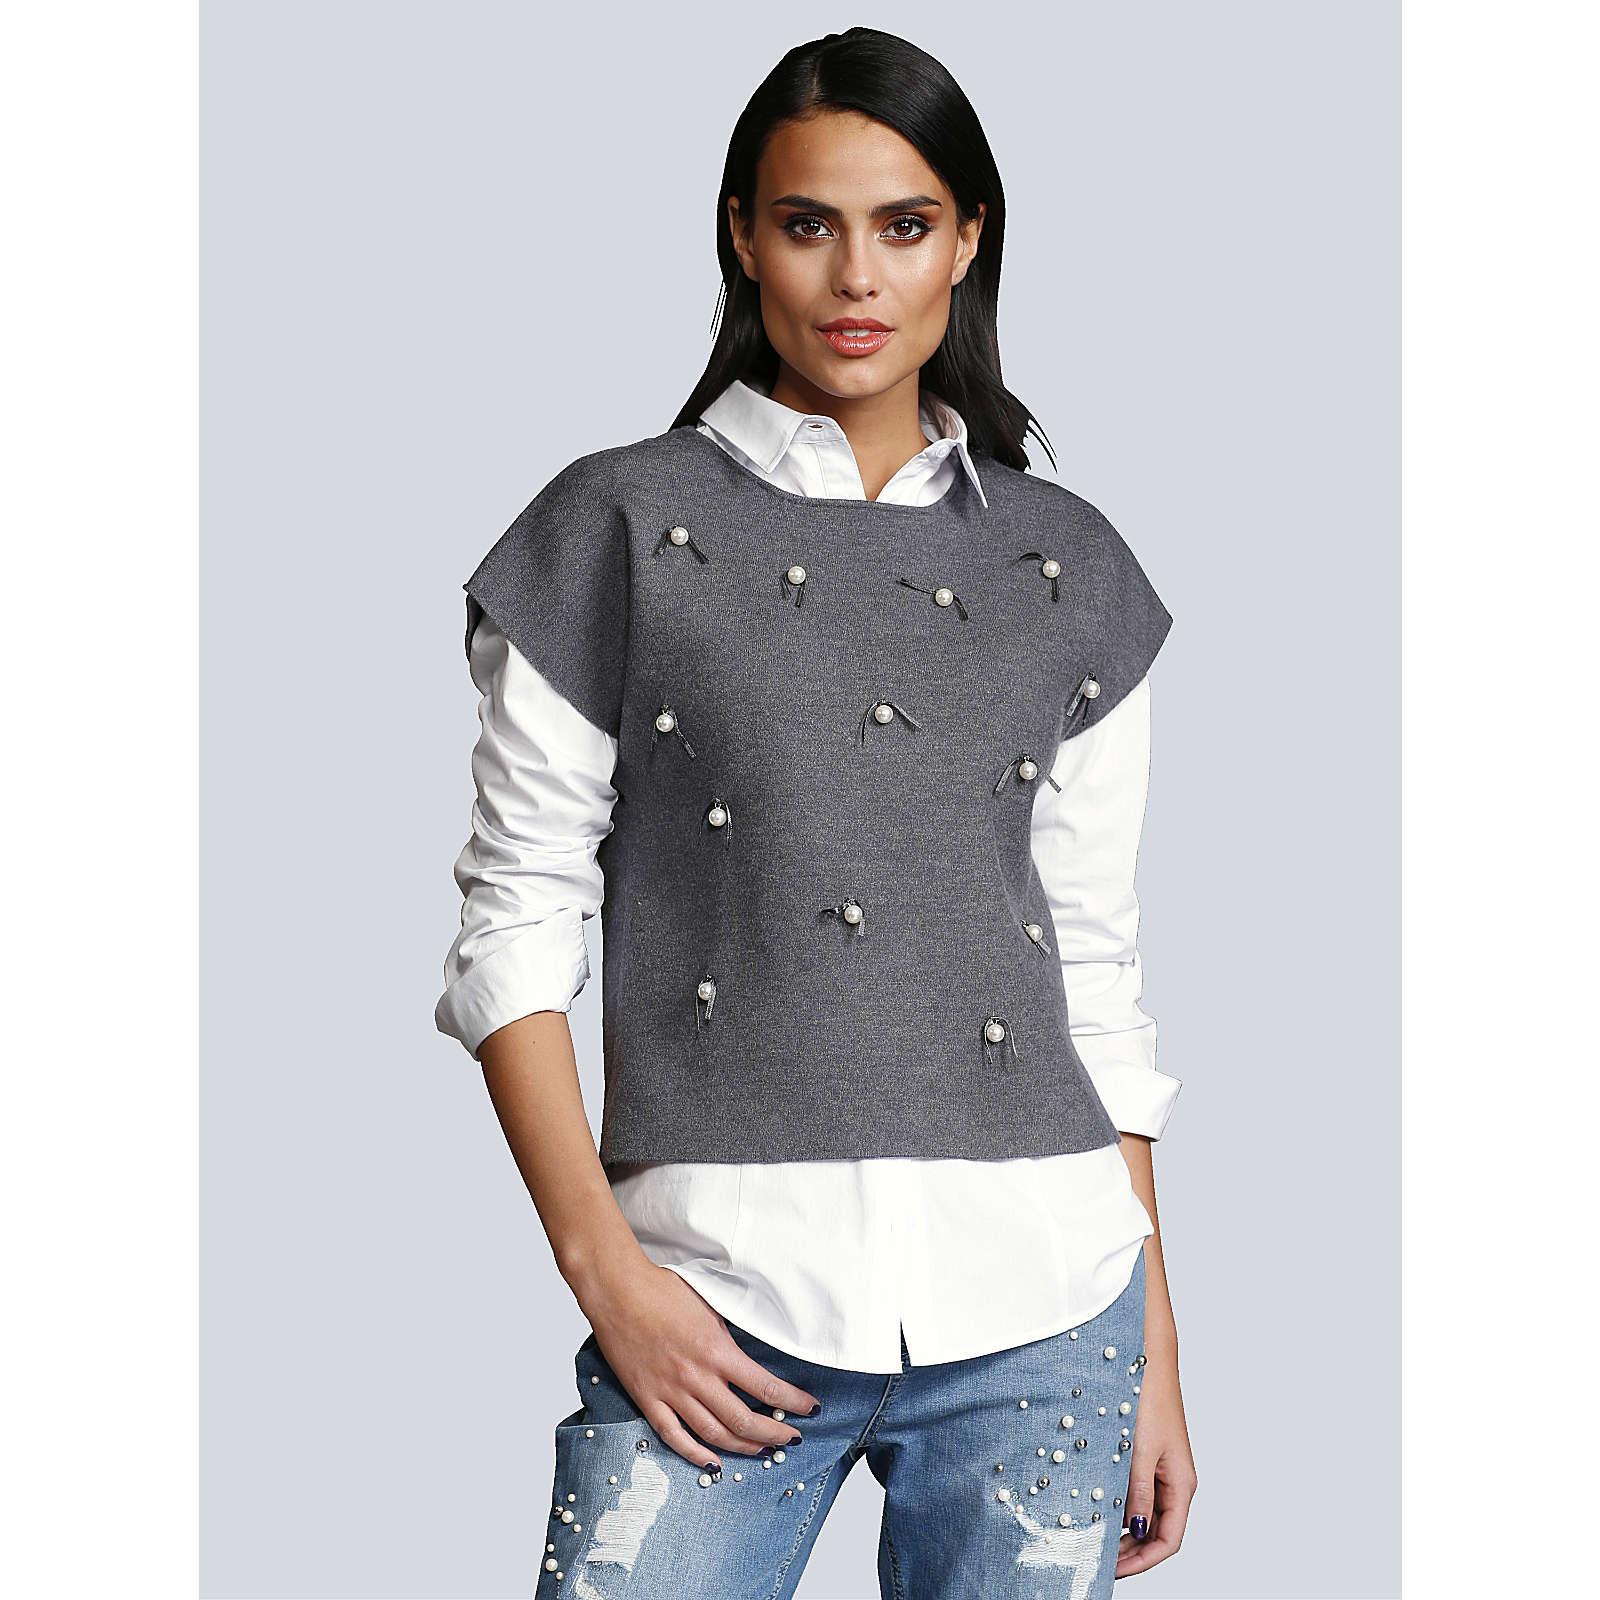 Alba Moda Kurzarm-Pullover grau Damen Gr. 46